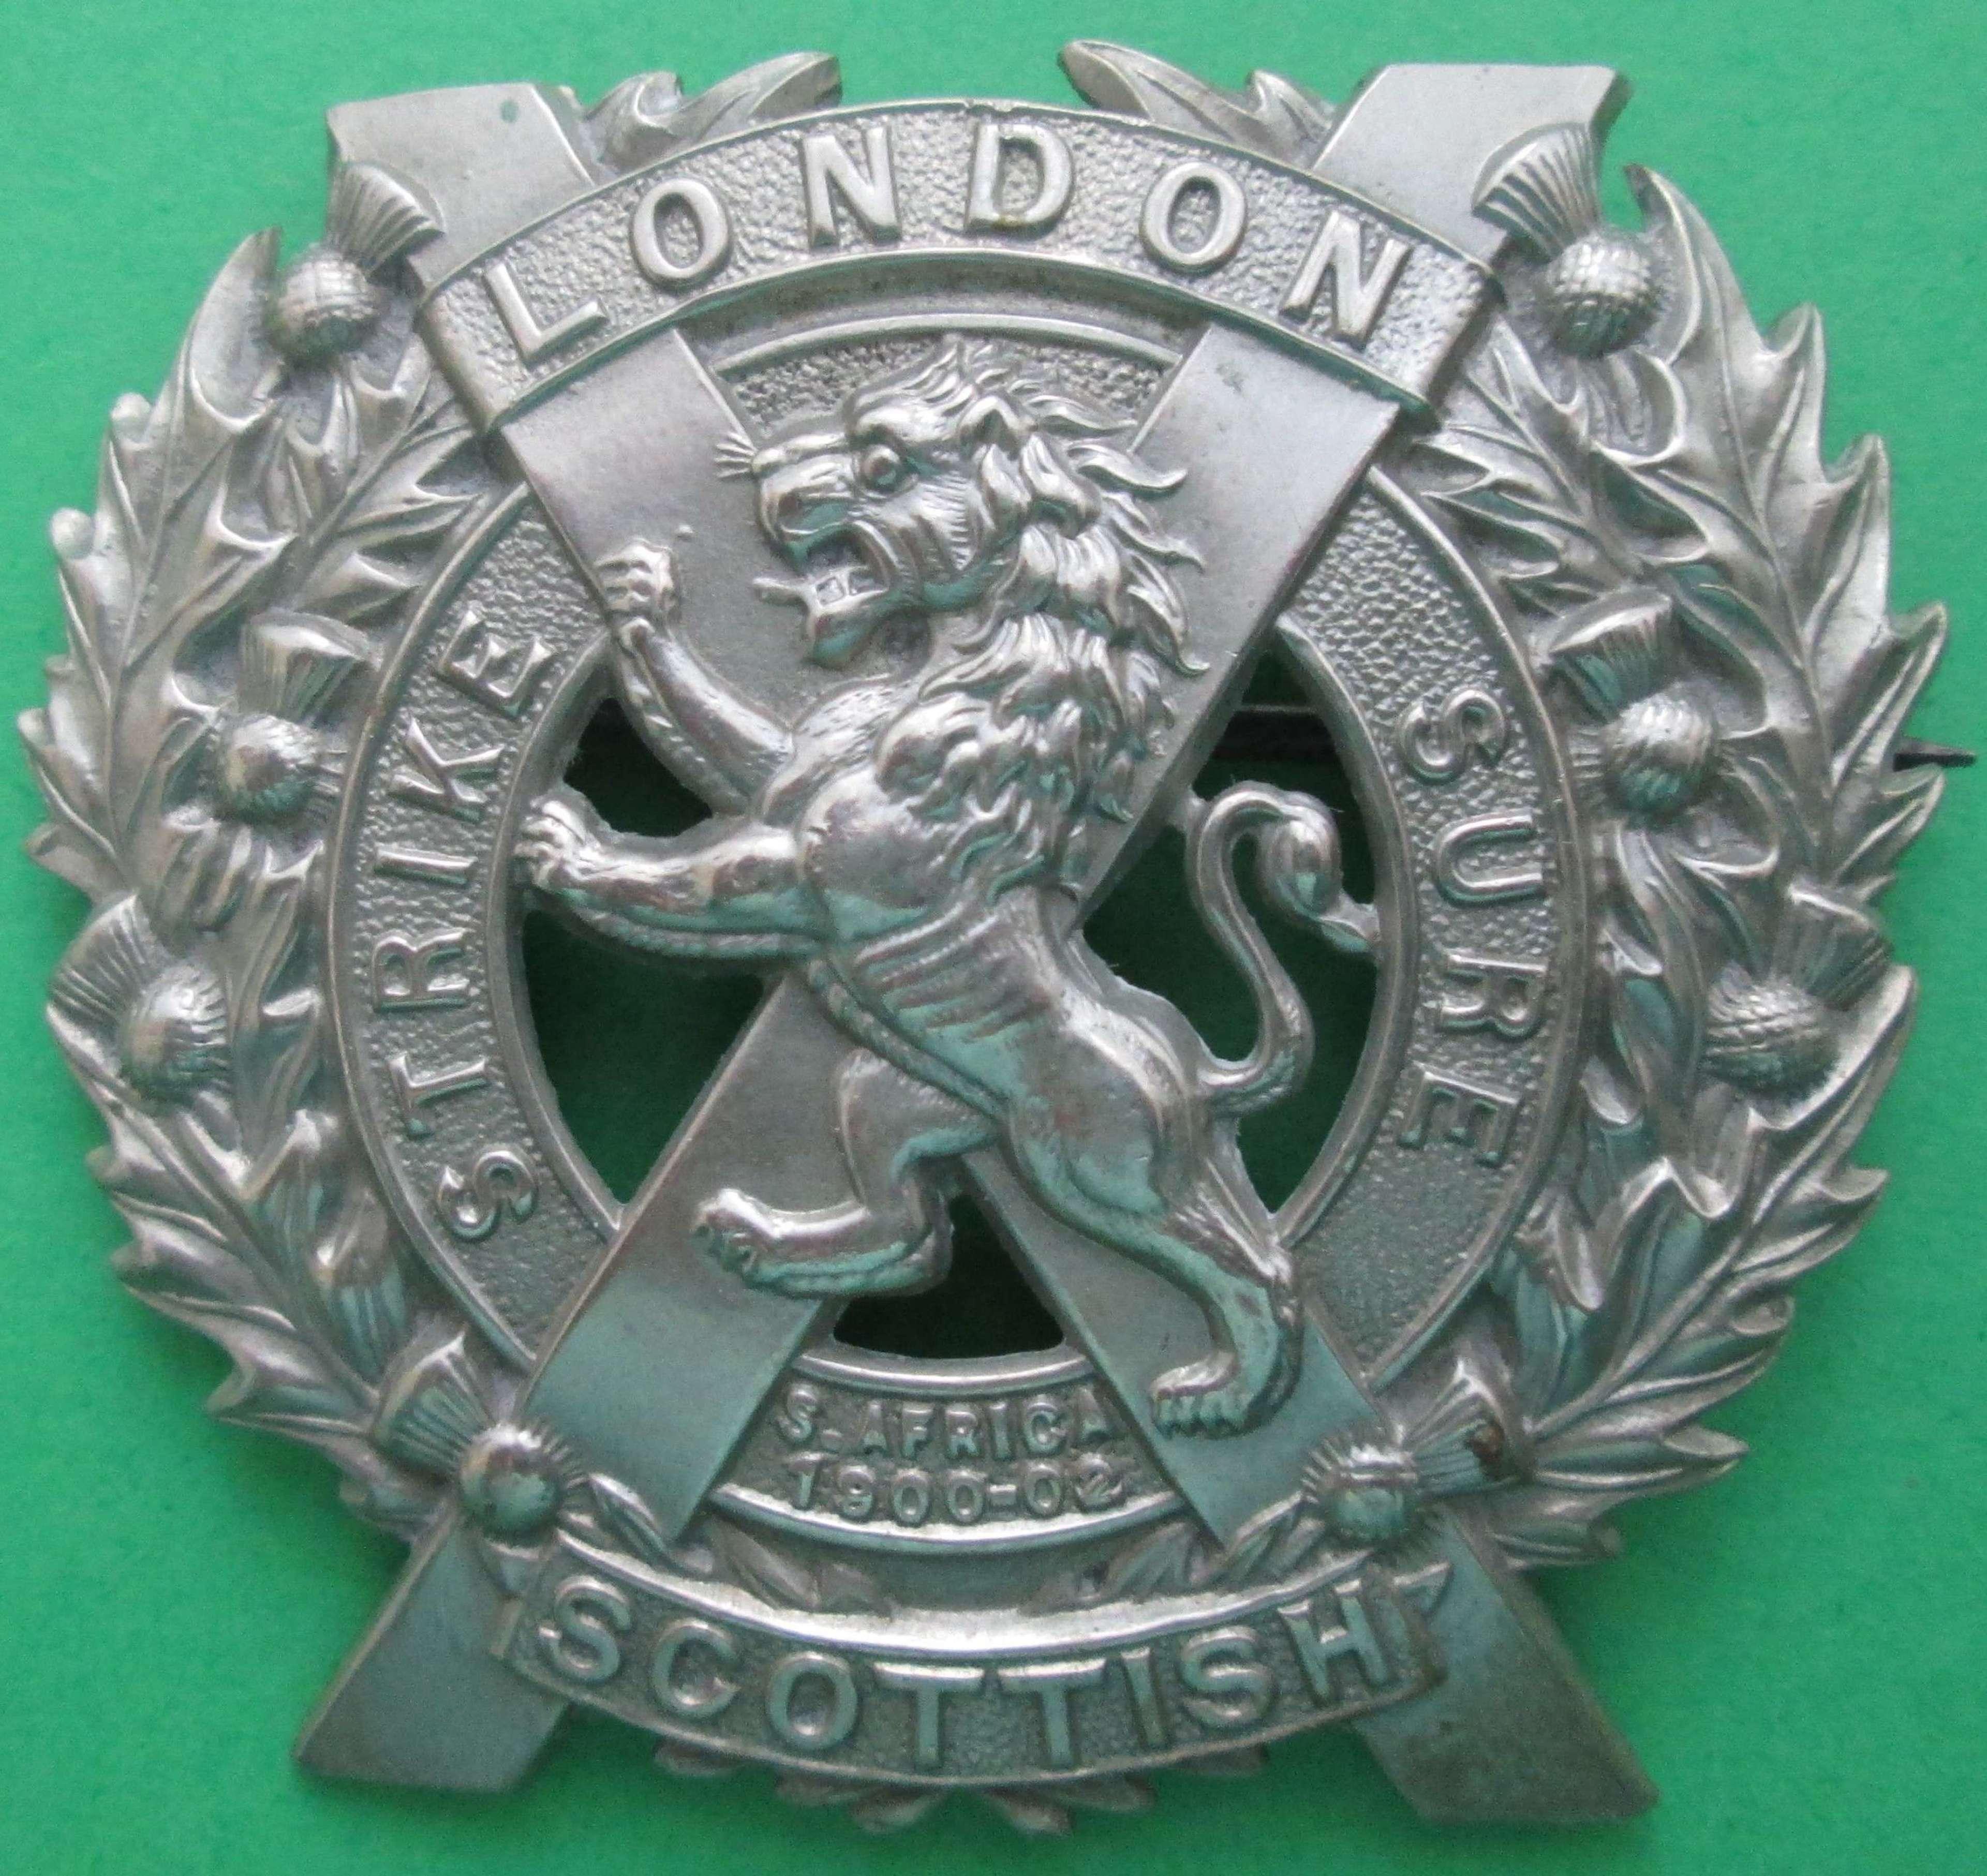 A LONDON SCOTTISH GLENGARRY BADGE